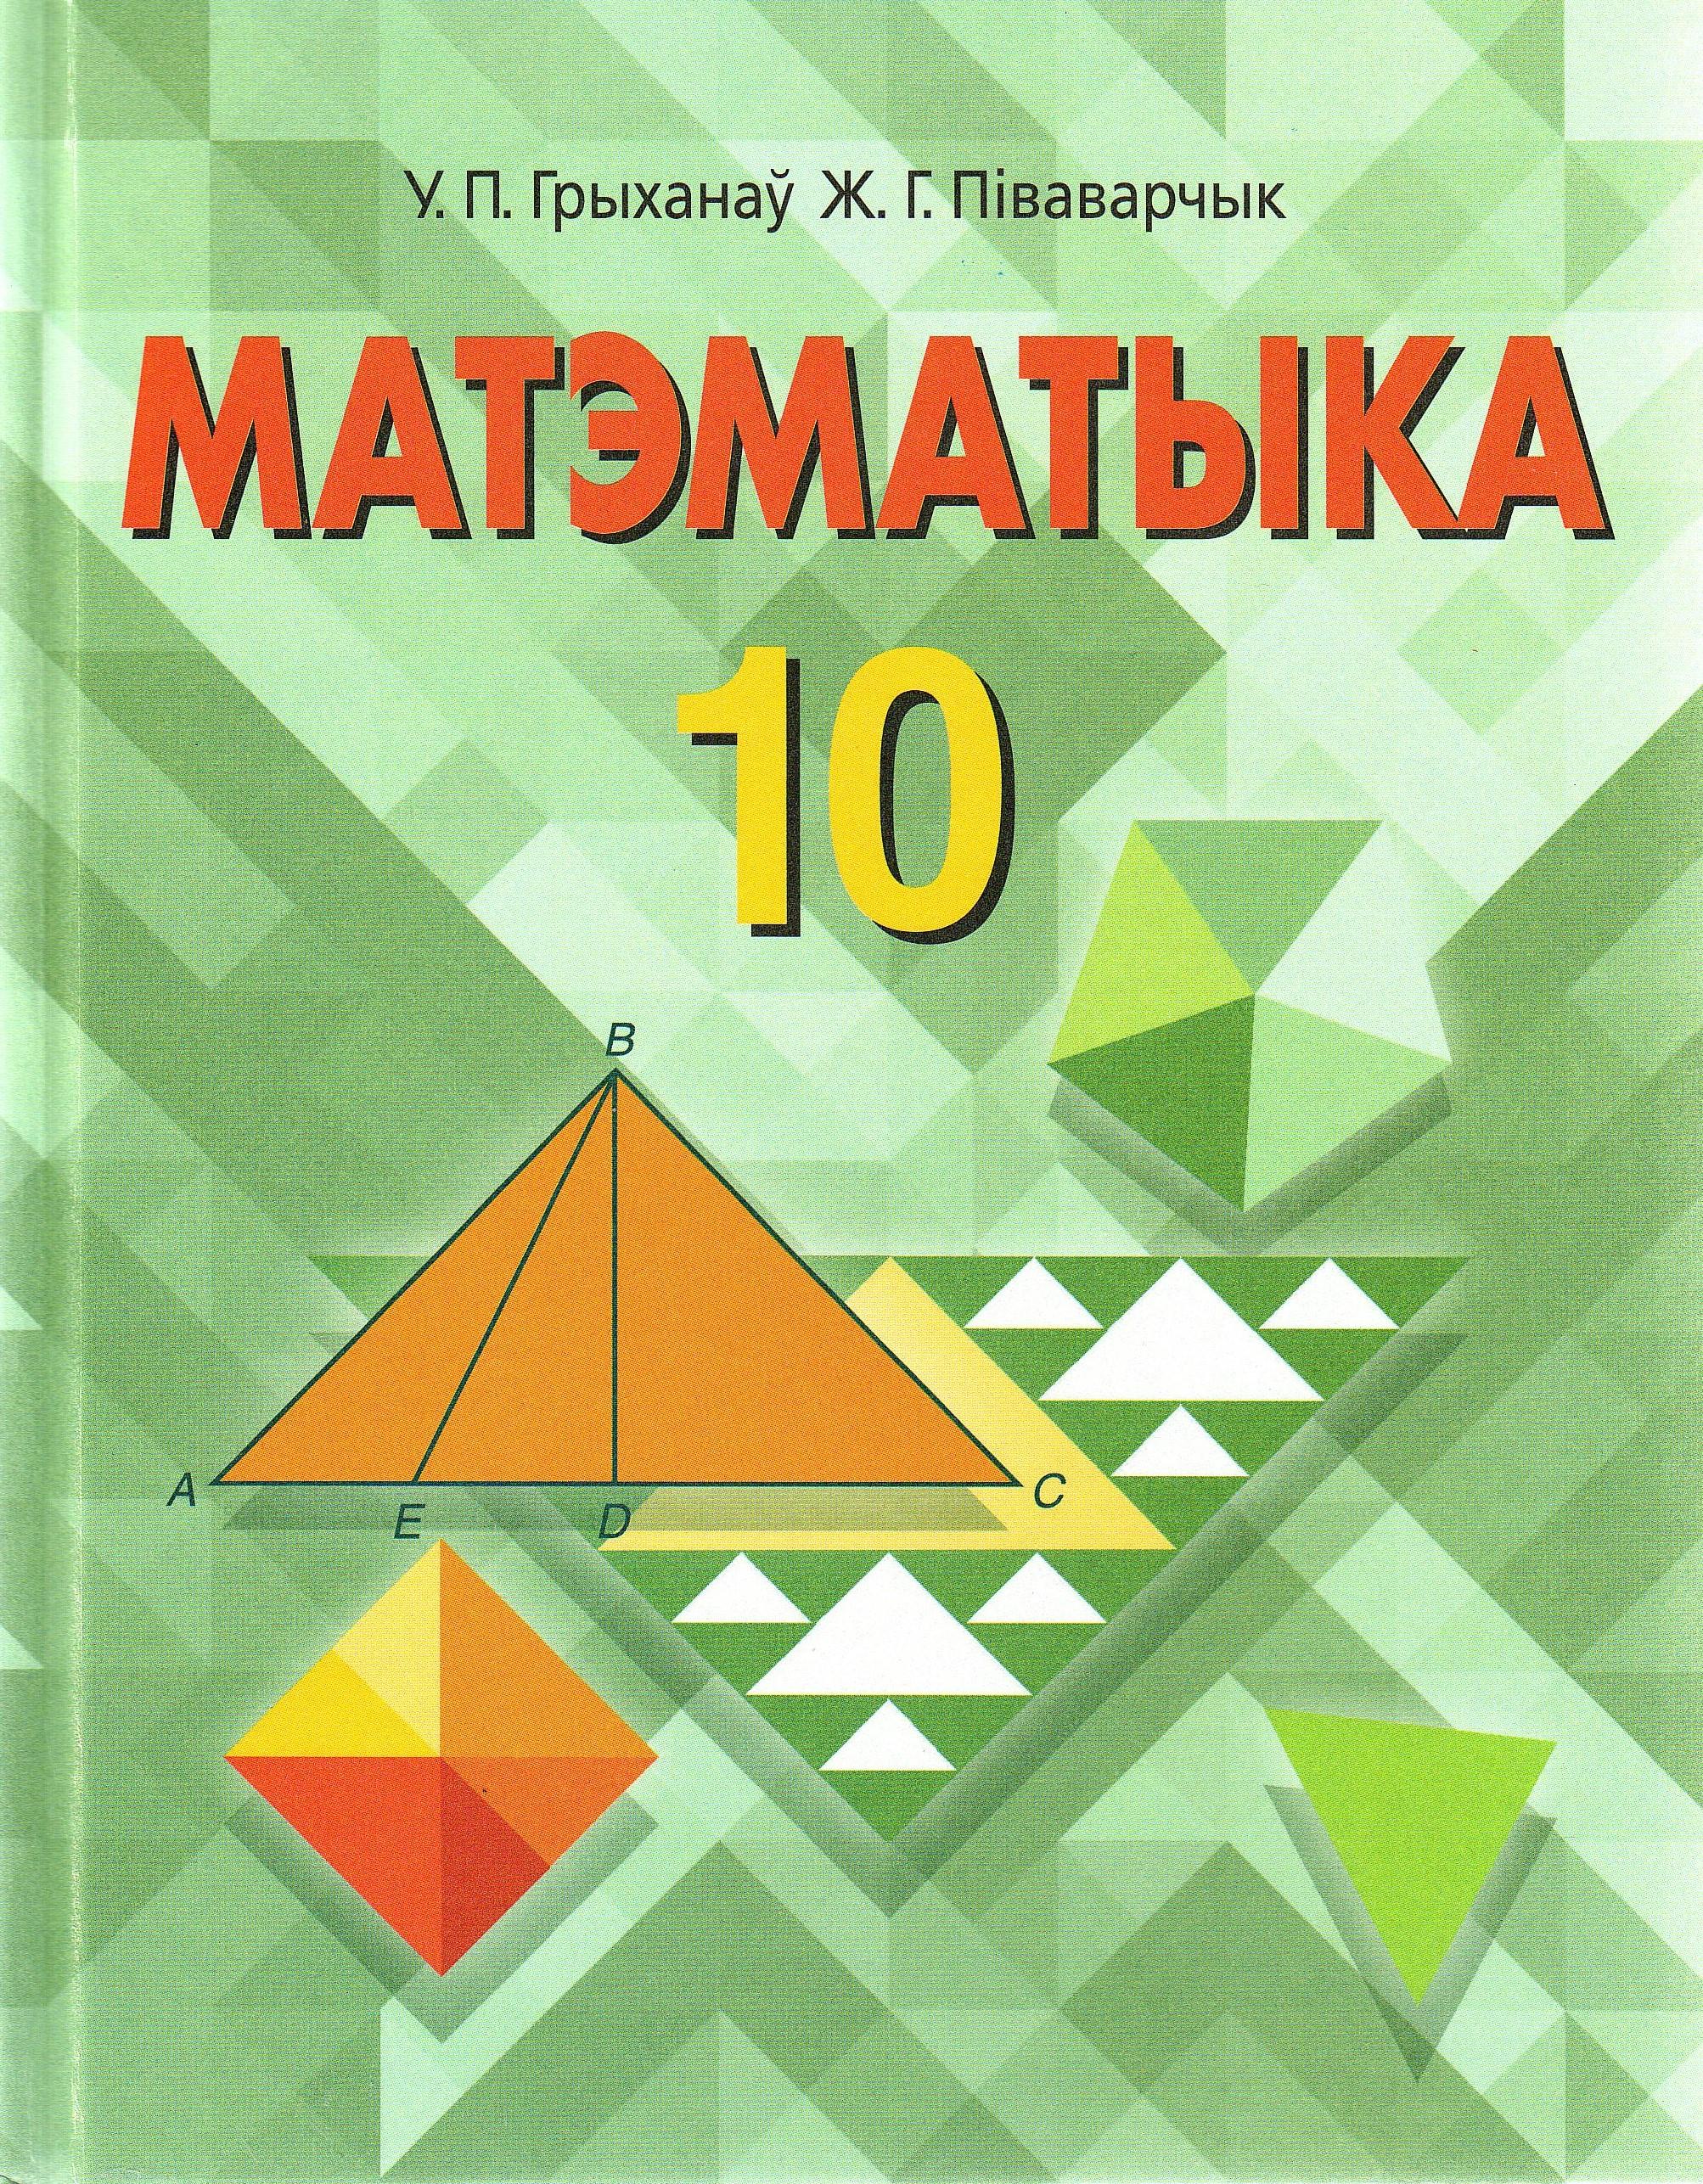 Матэматыка, 10 клас